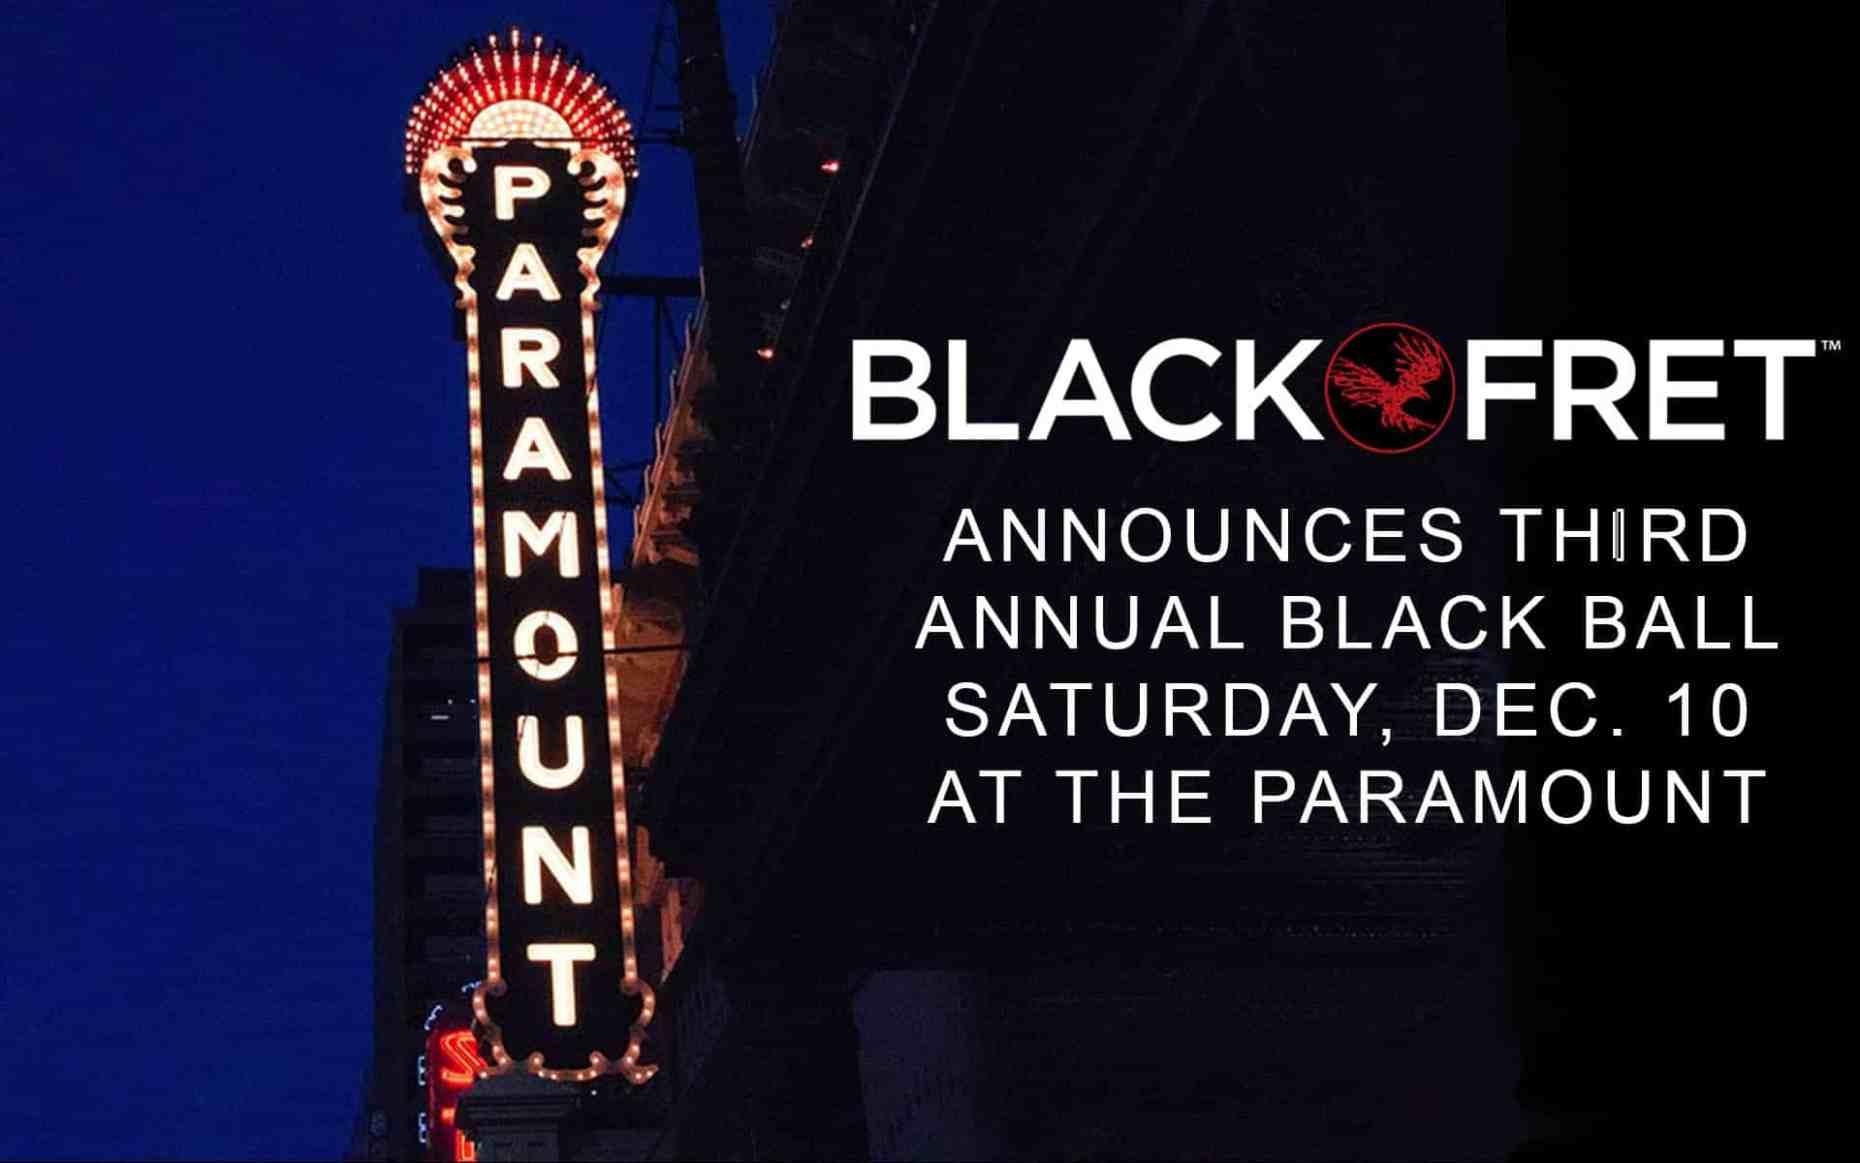 BLACK FRET ANNOUNCES THIRD ANNUAL BLACK BALL SATURDAY, DEC. 10 AT THE PARAMOUNT